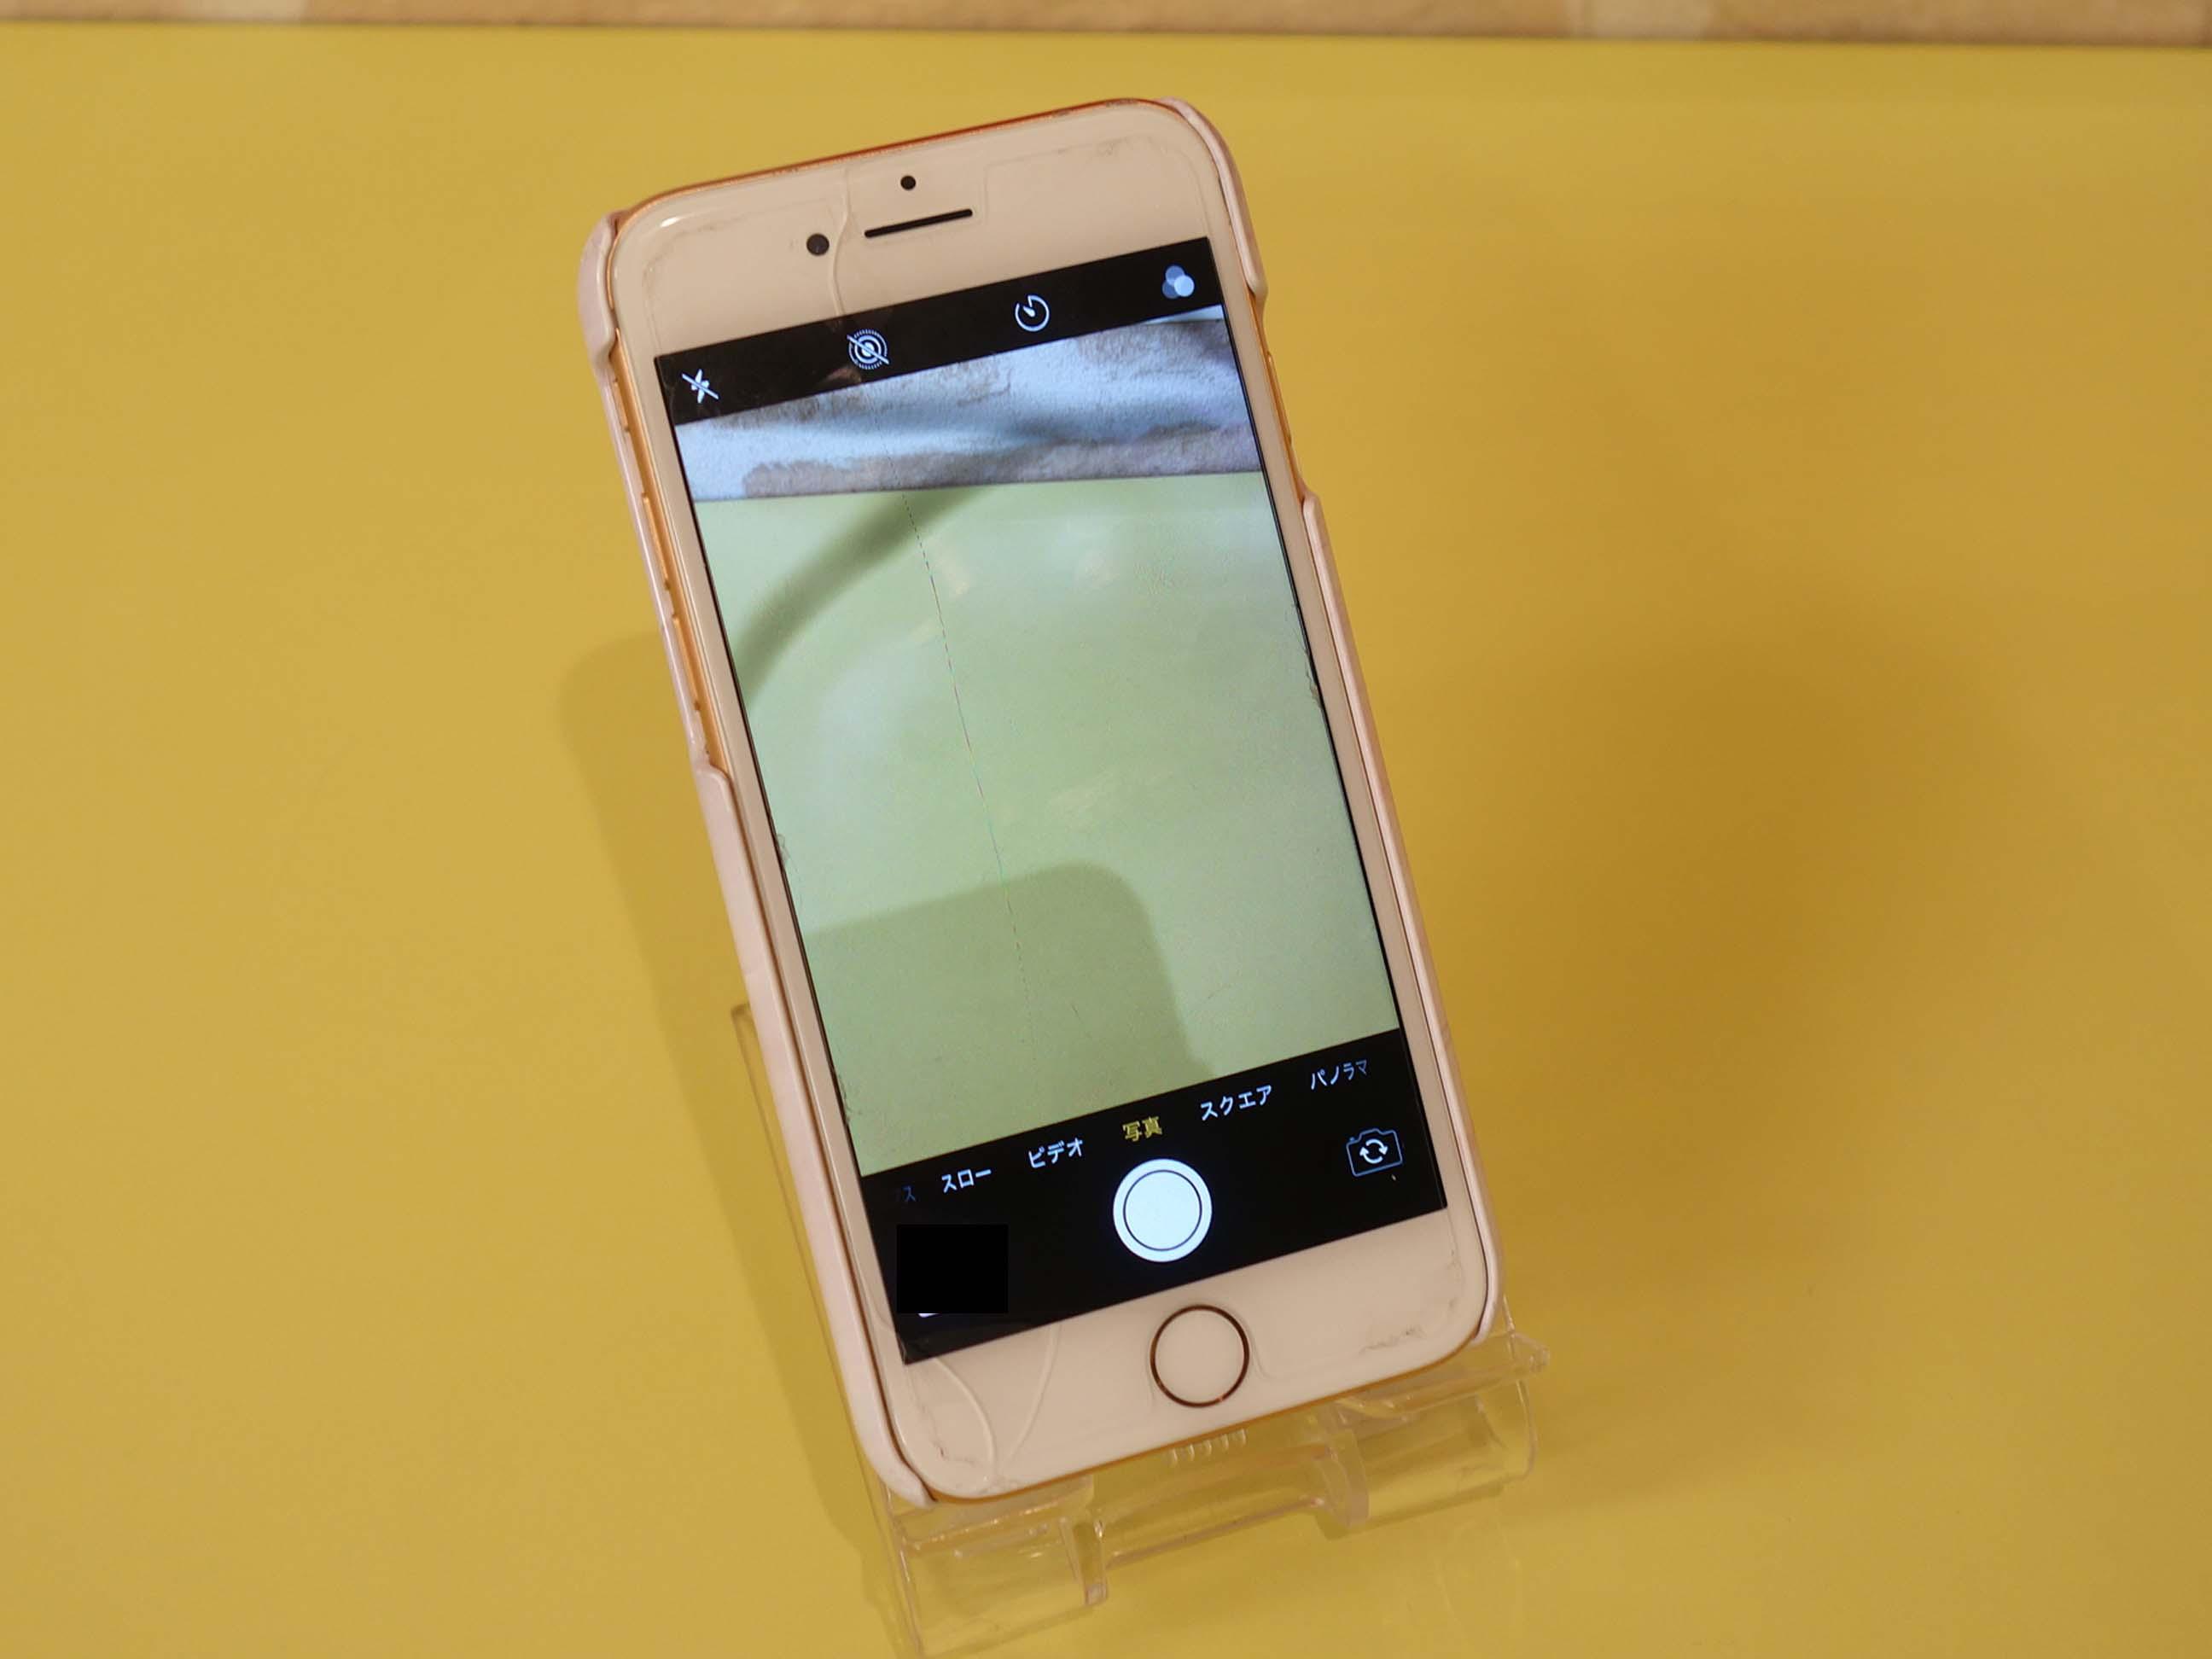 iPhone8のガラスとアウトカメラ交換修理で名古屋市内からご来店!アイフォン修理のクイック名古屋